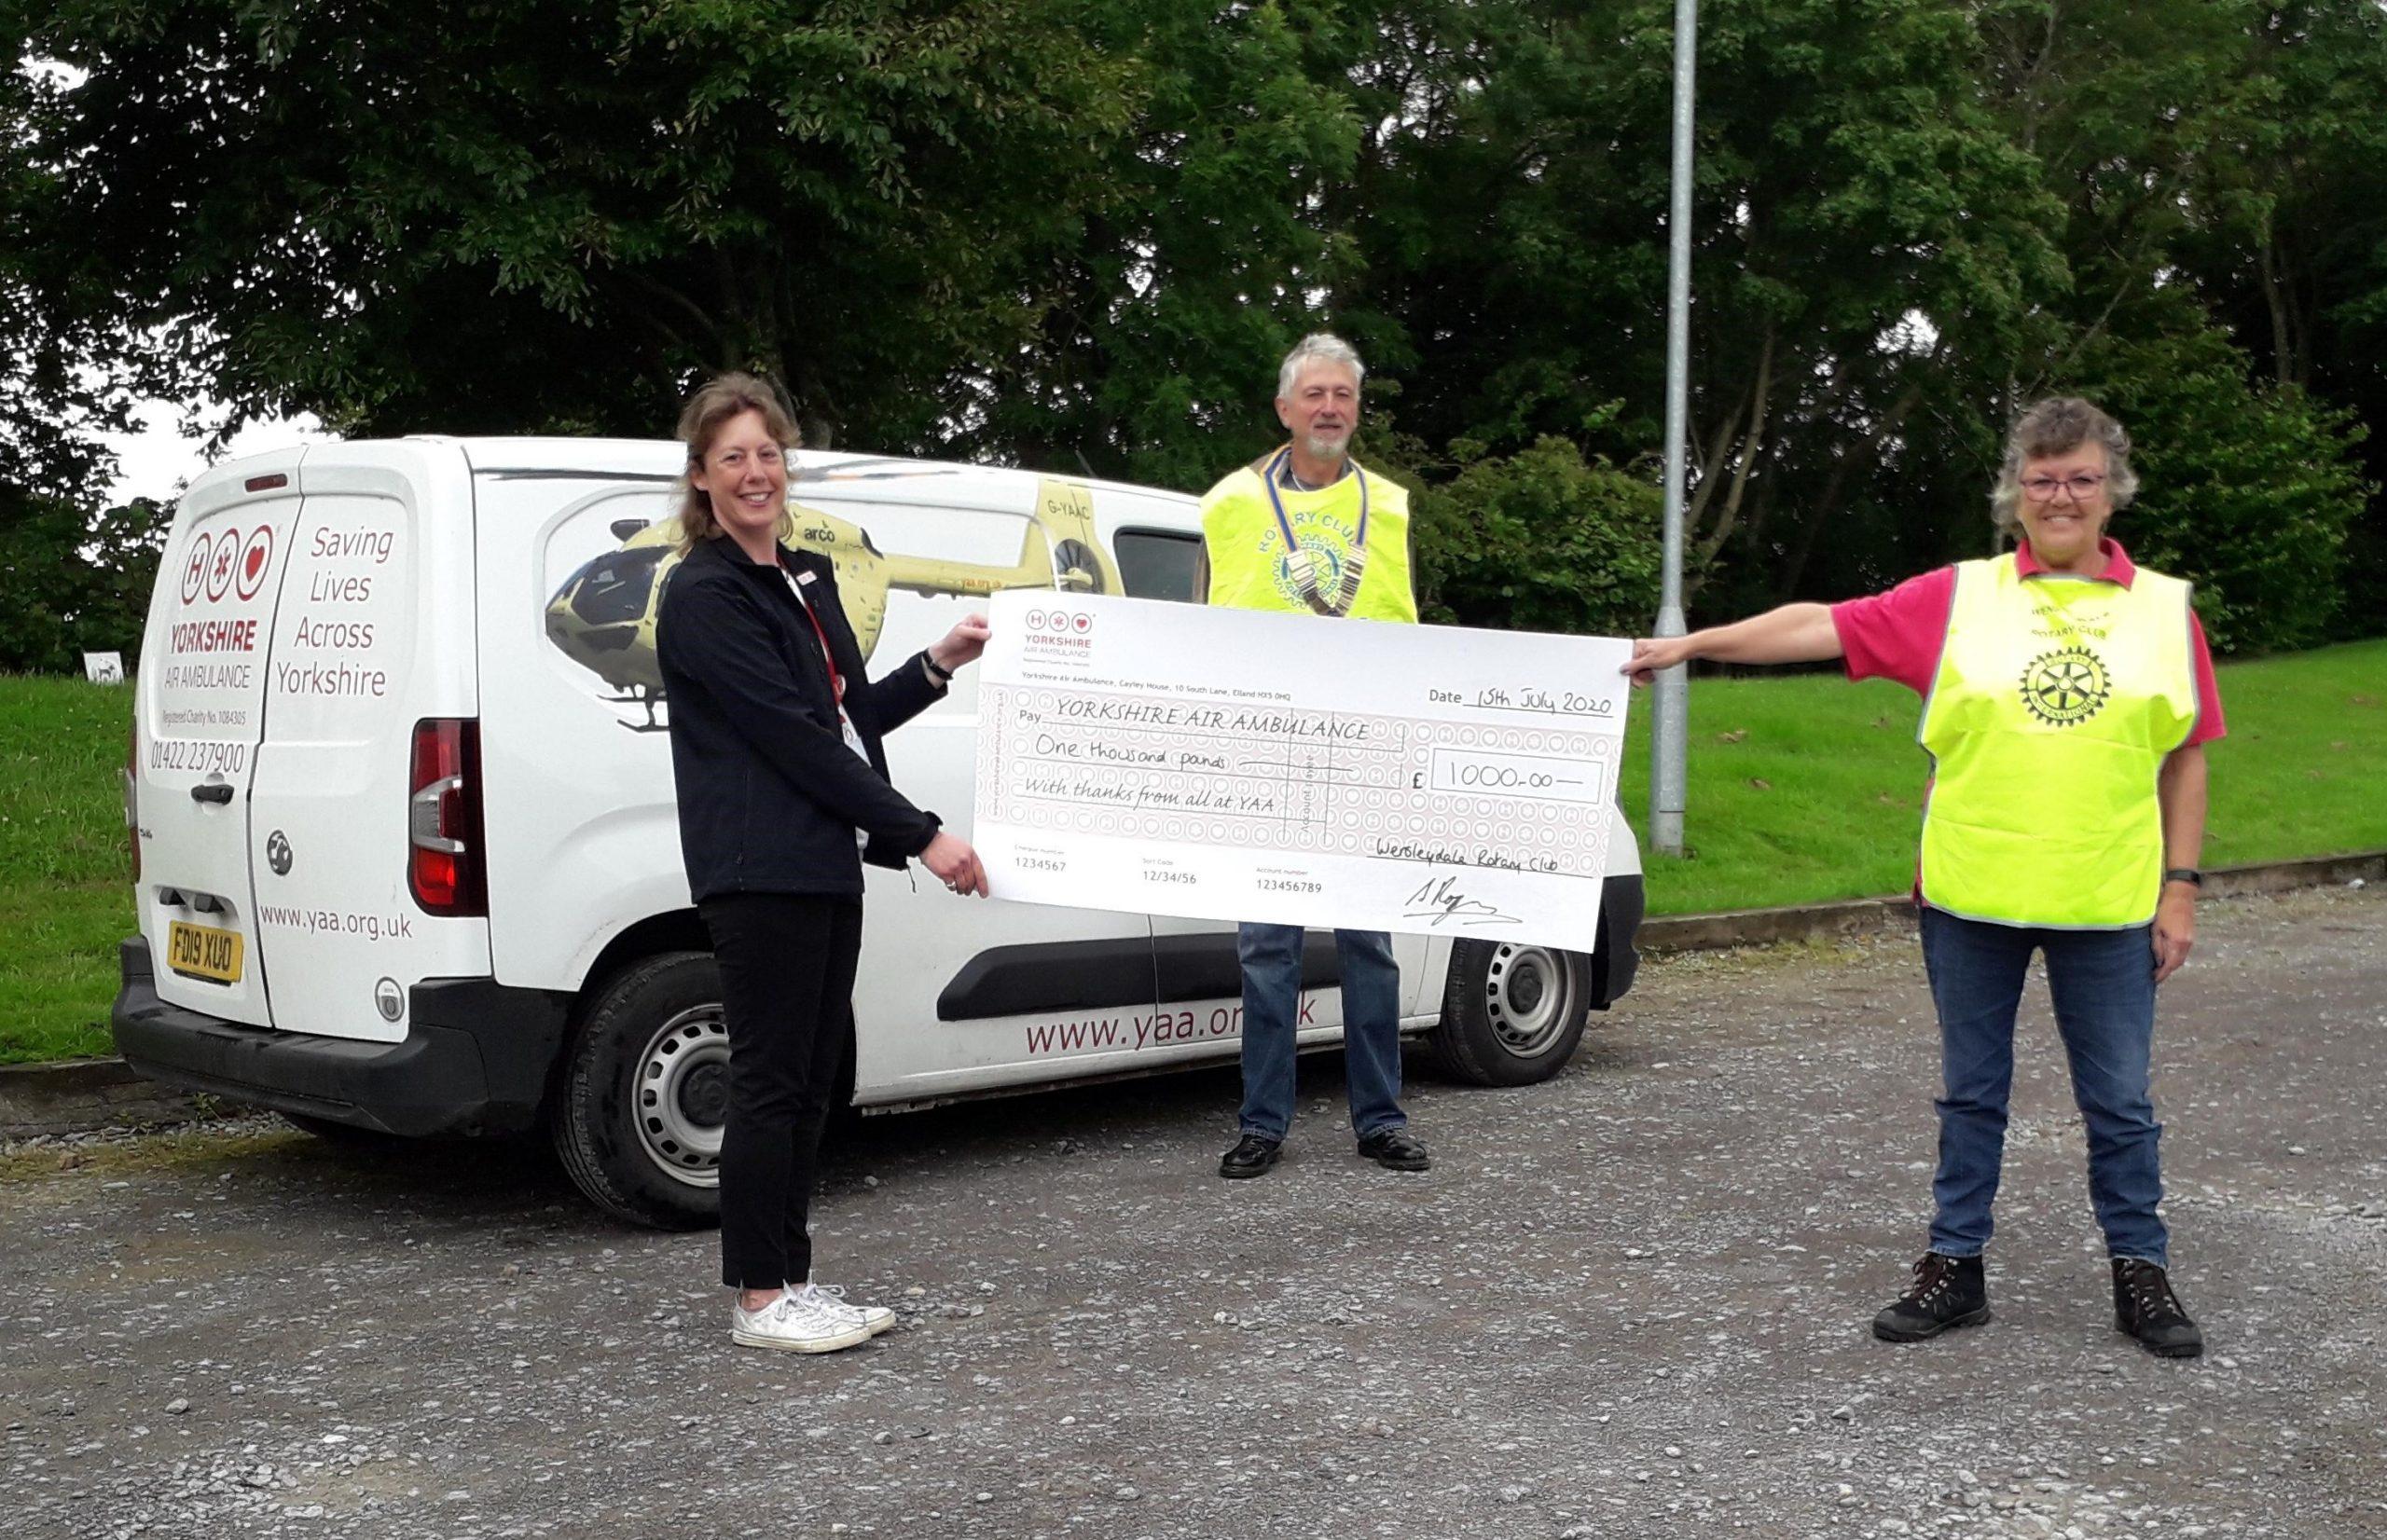 Wensleydale Rotary Club raise £1,000 for the YAA